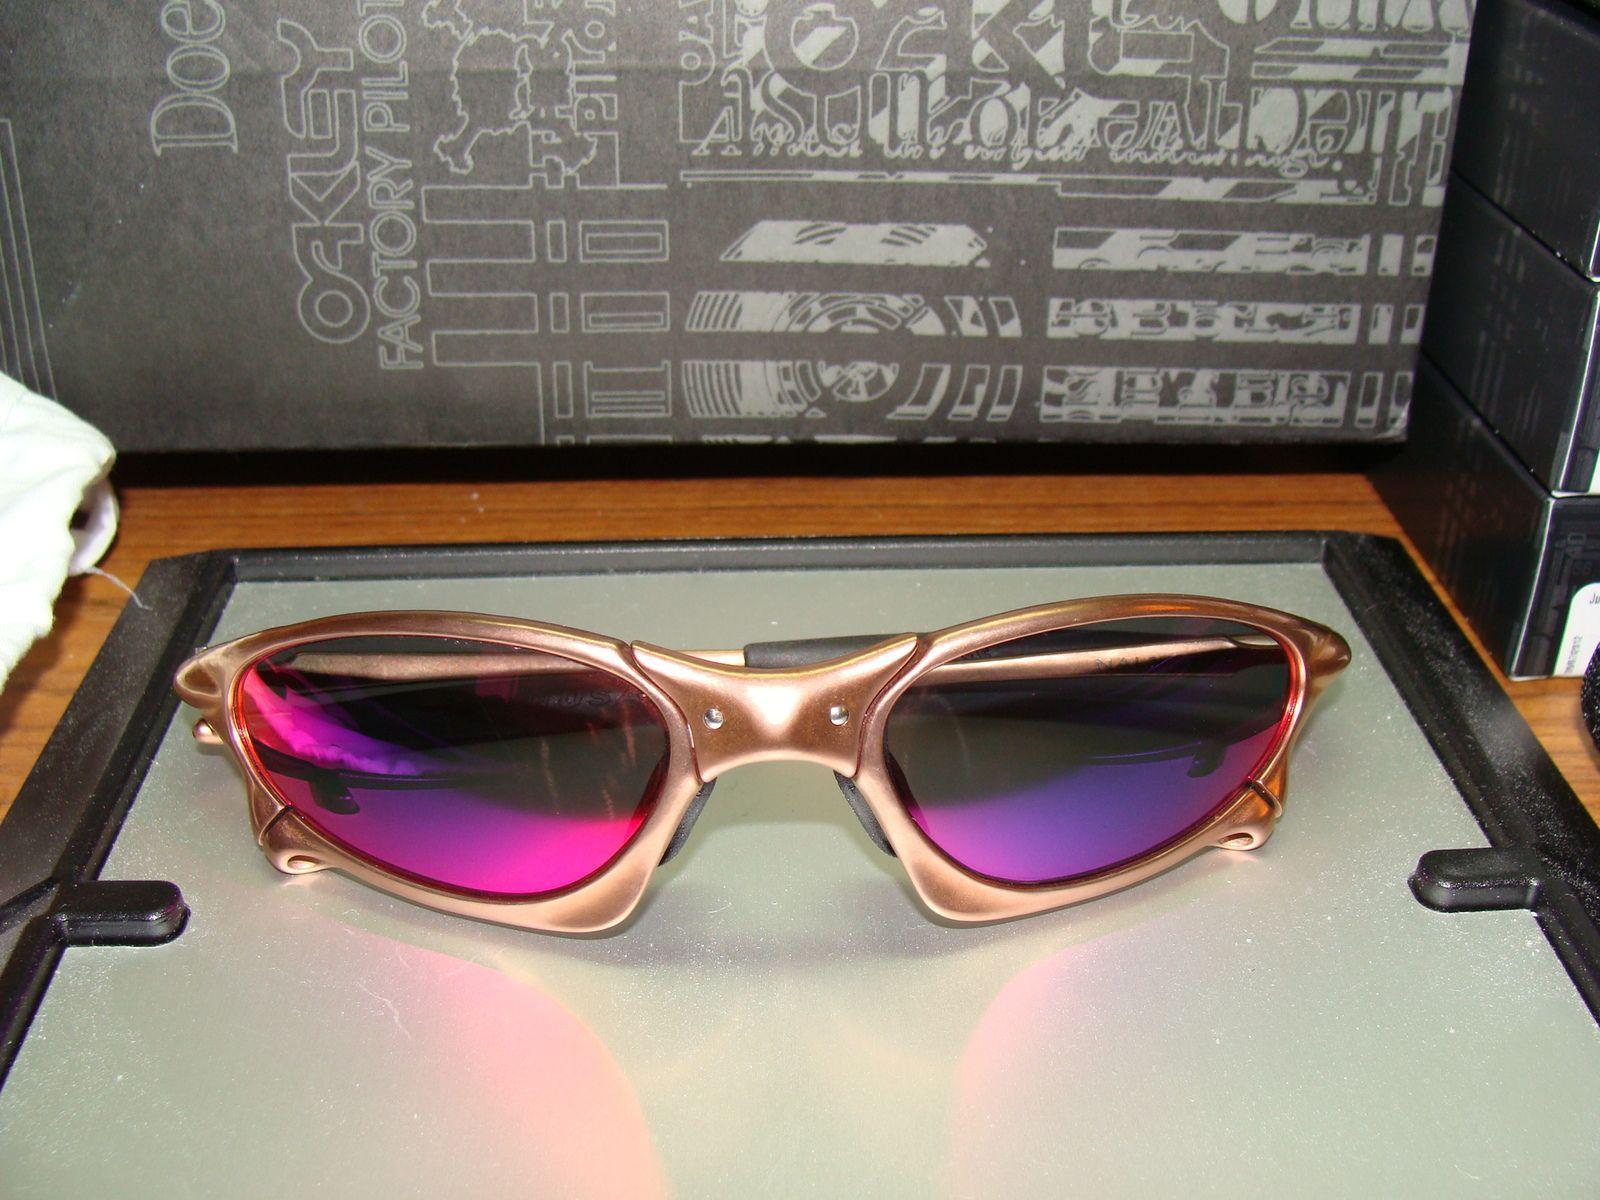 2 Sets Of Pos Red OEM Penny Lenses - dsc03592q.jpg